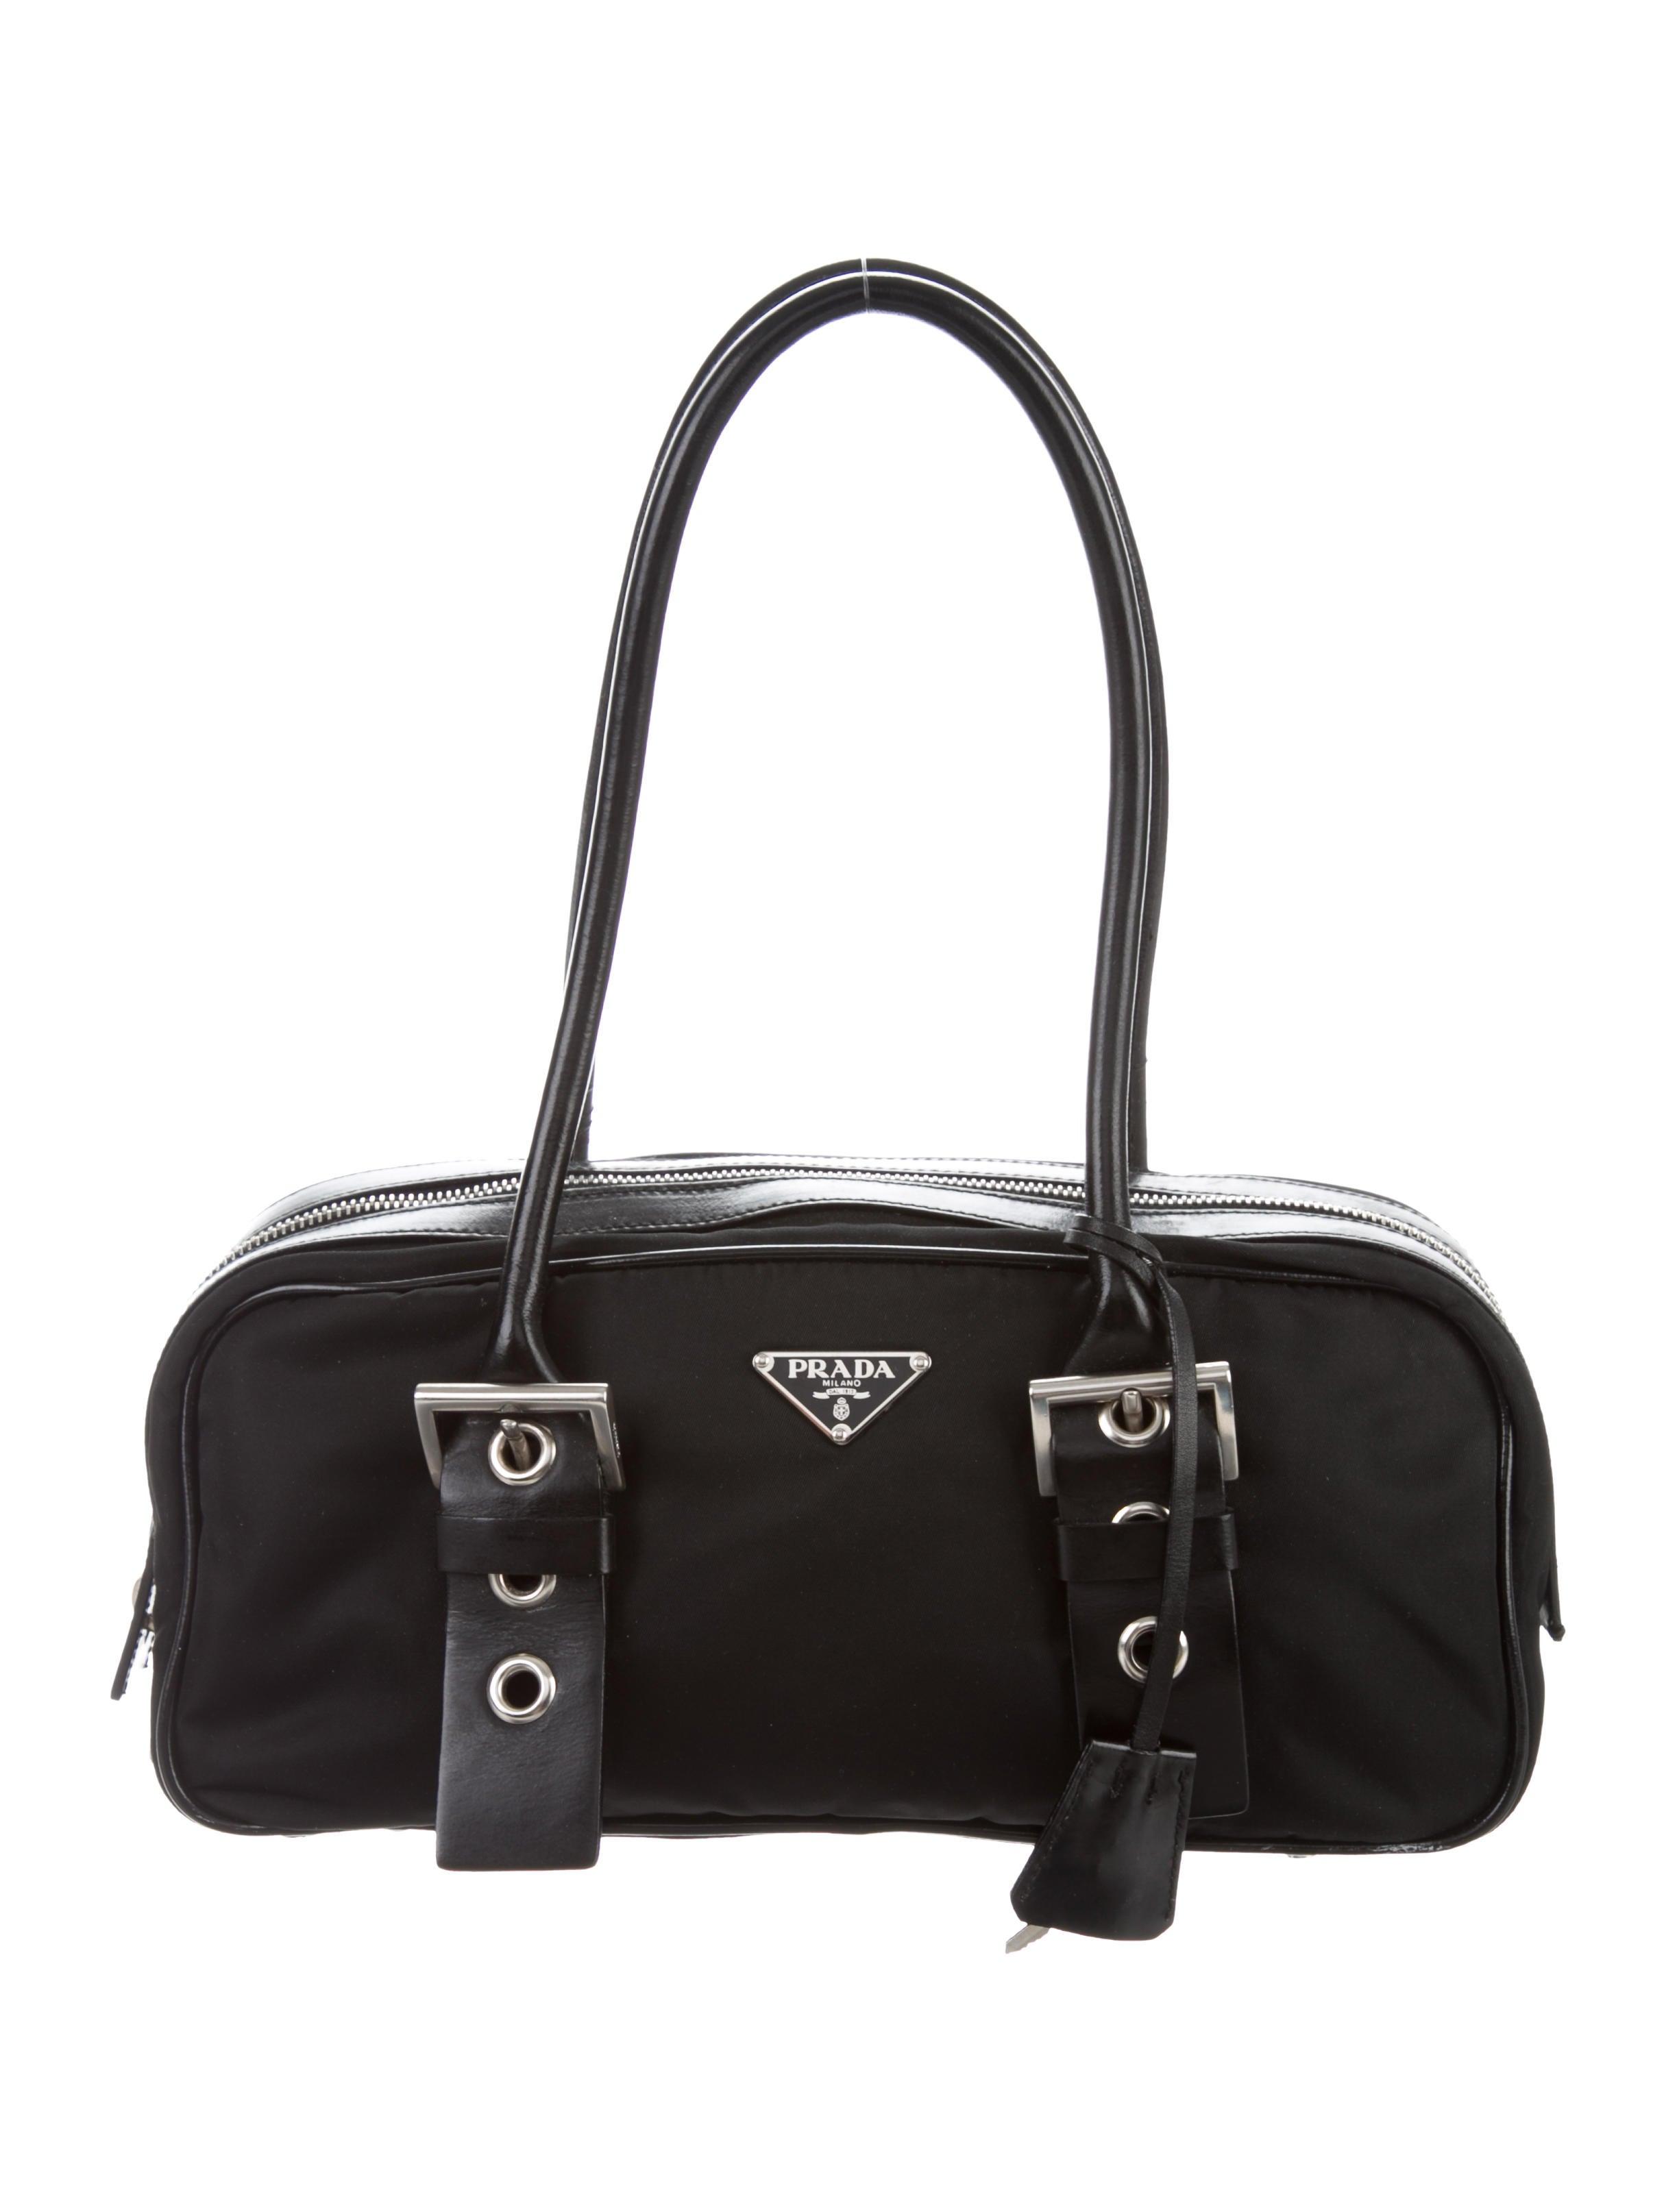 beeb0365a2fc Prada Leather Trimmed Tessuto Prada Prada Prada Tessuto Leather Leather Bag Trimmed  Trimmed Bag Tessuto Bag ...